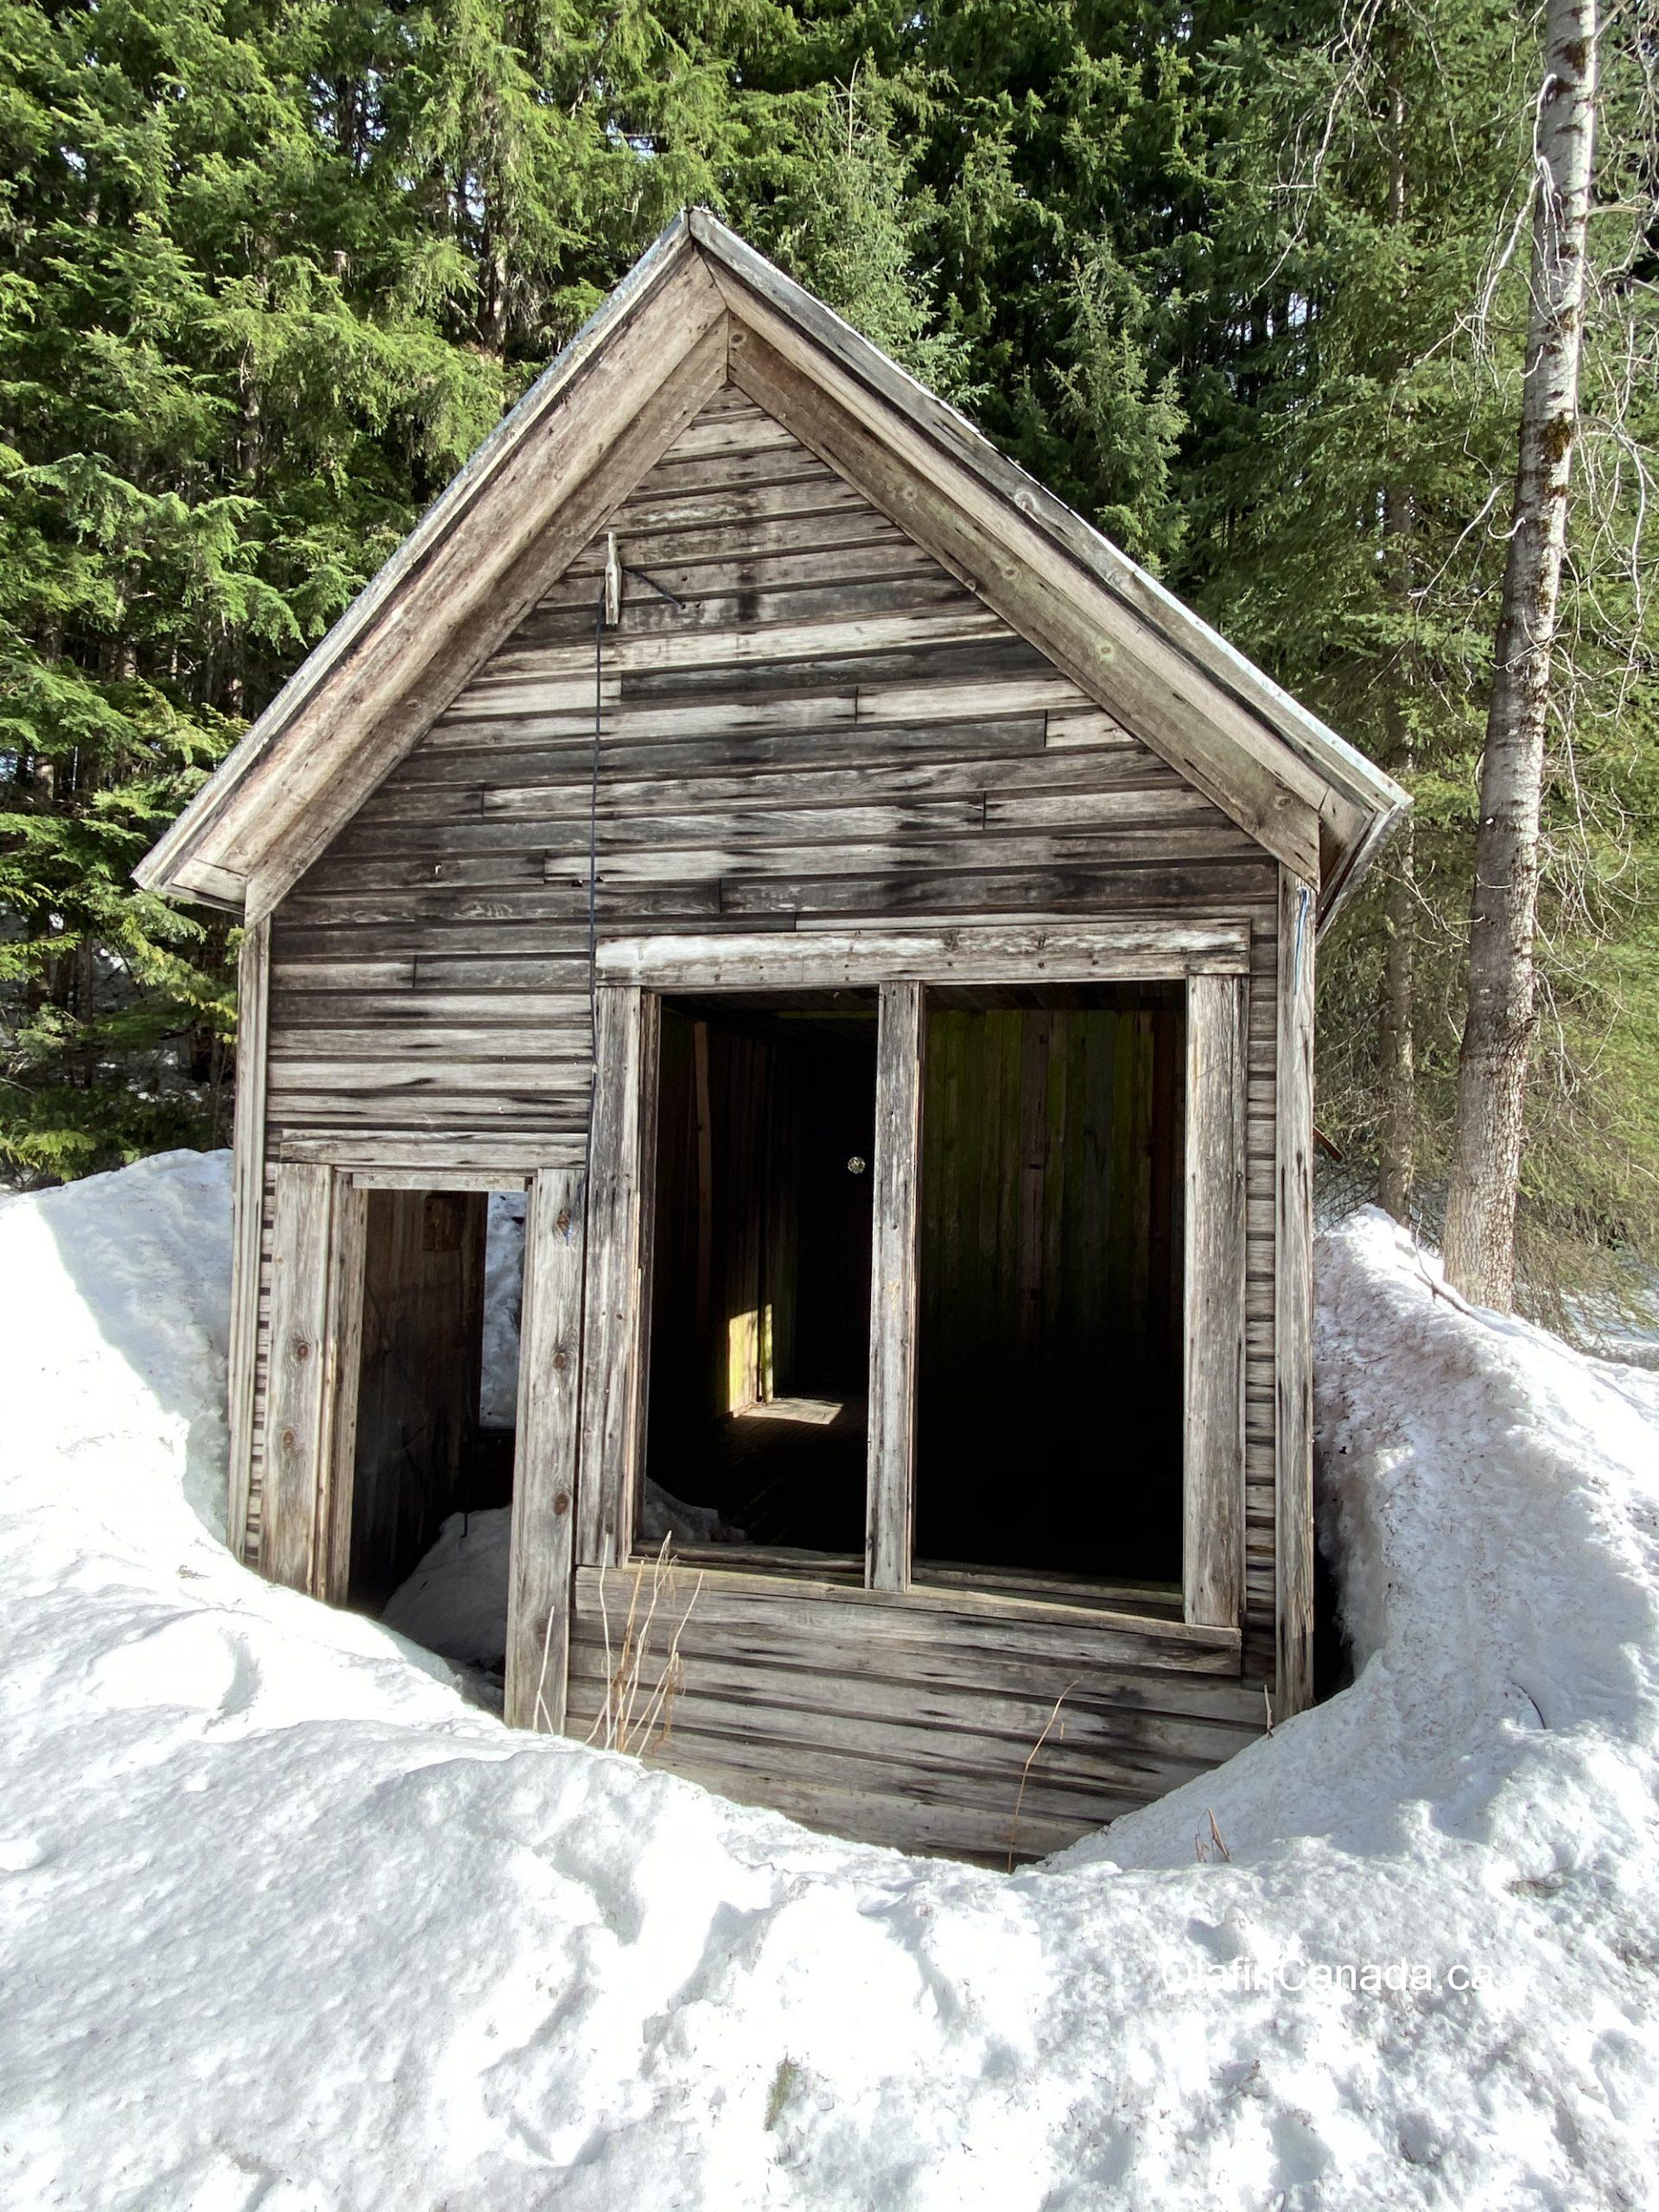 Cody house empty #olafincanada #britishcolumbia #discoverbc #abandonedbc #cody